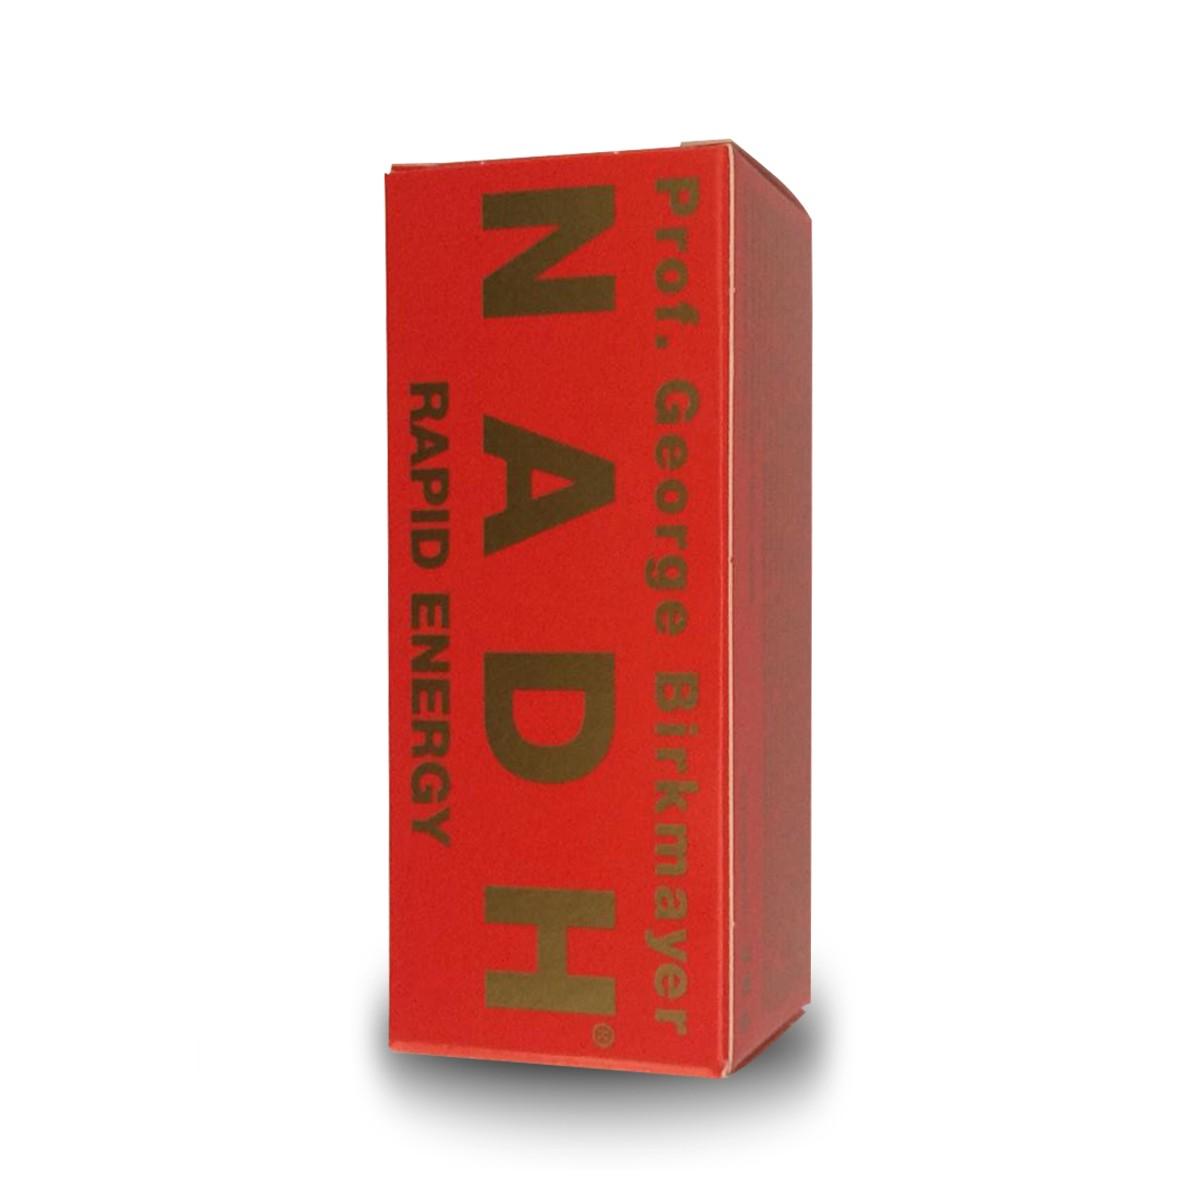 Nadh Rapid Energy 20mg 60 Tablets